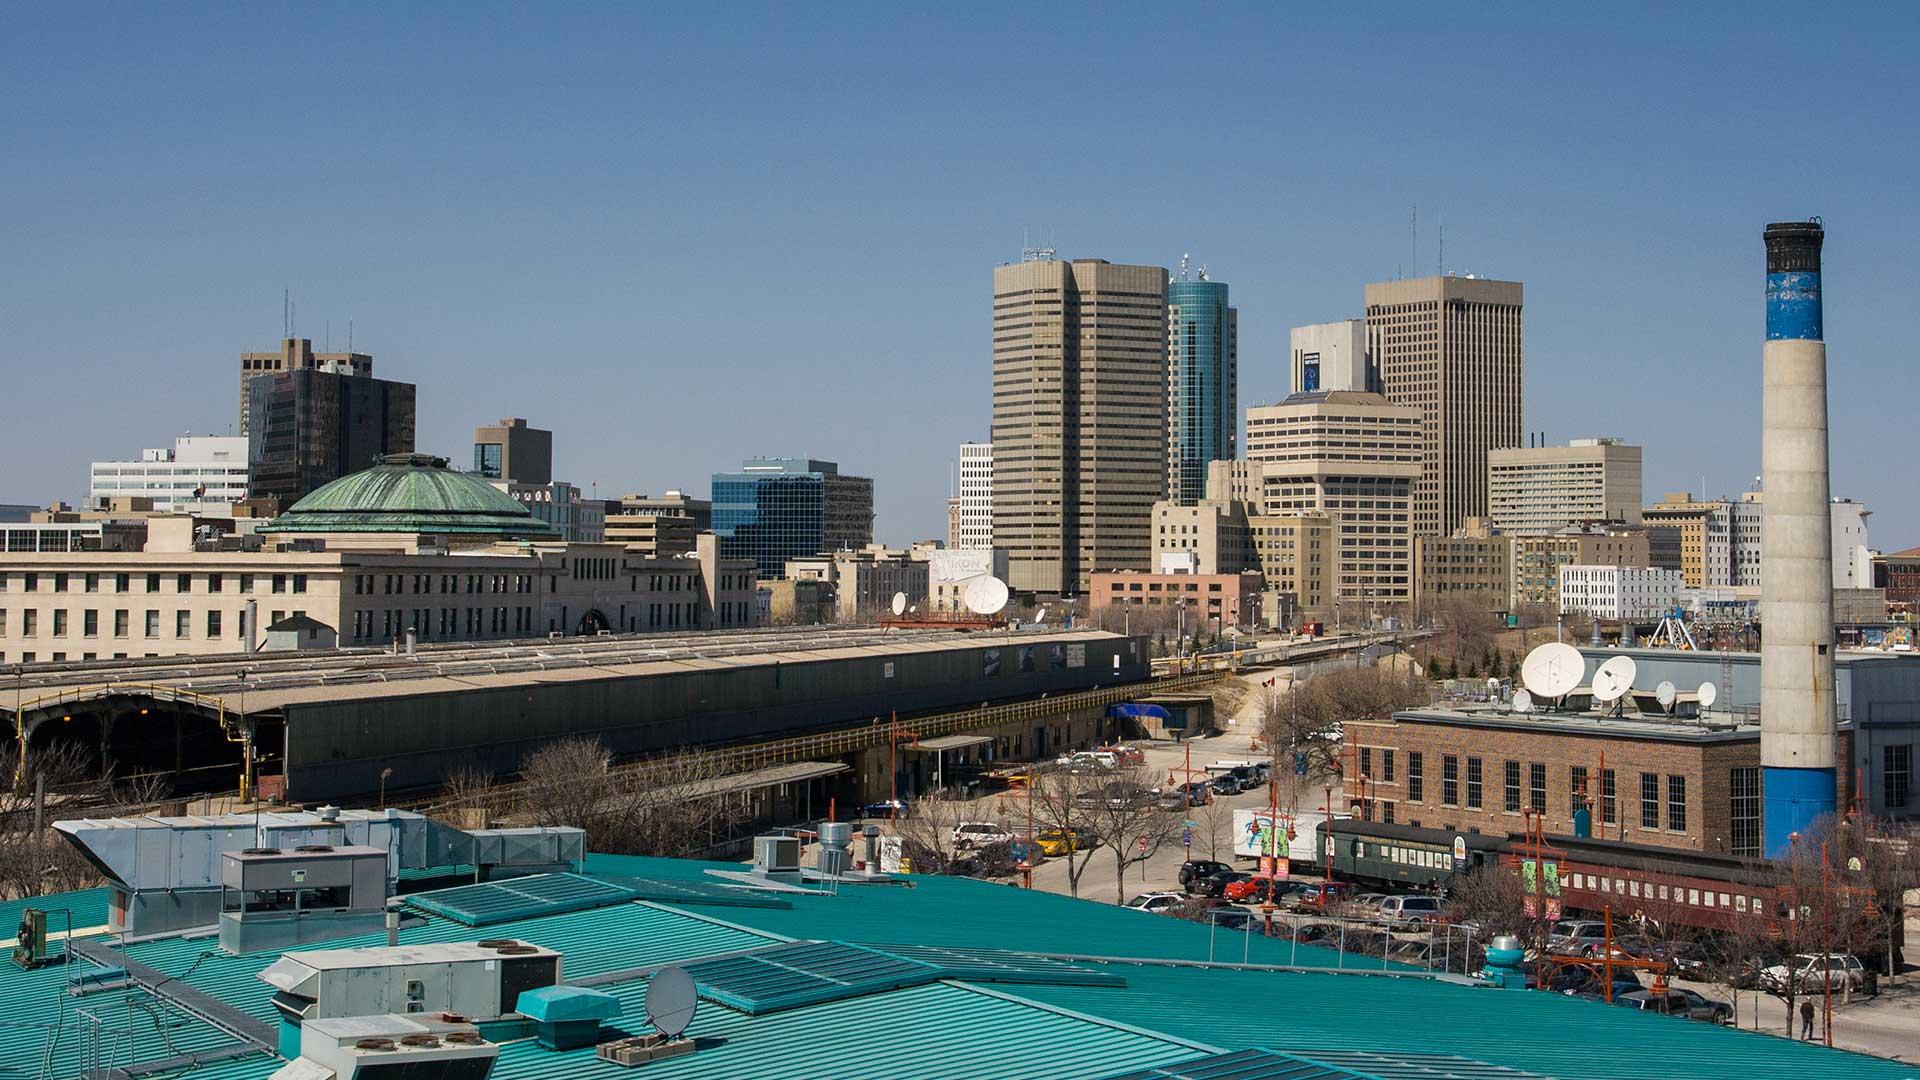 Winnipeg,-Manitoba-Voted-Northern-Minnesota's-Best-City.jpg